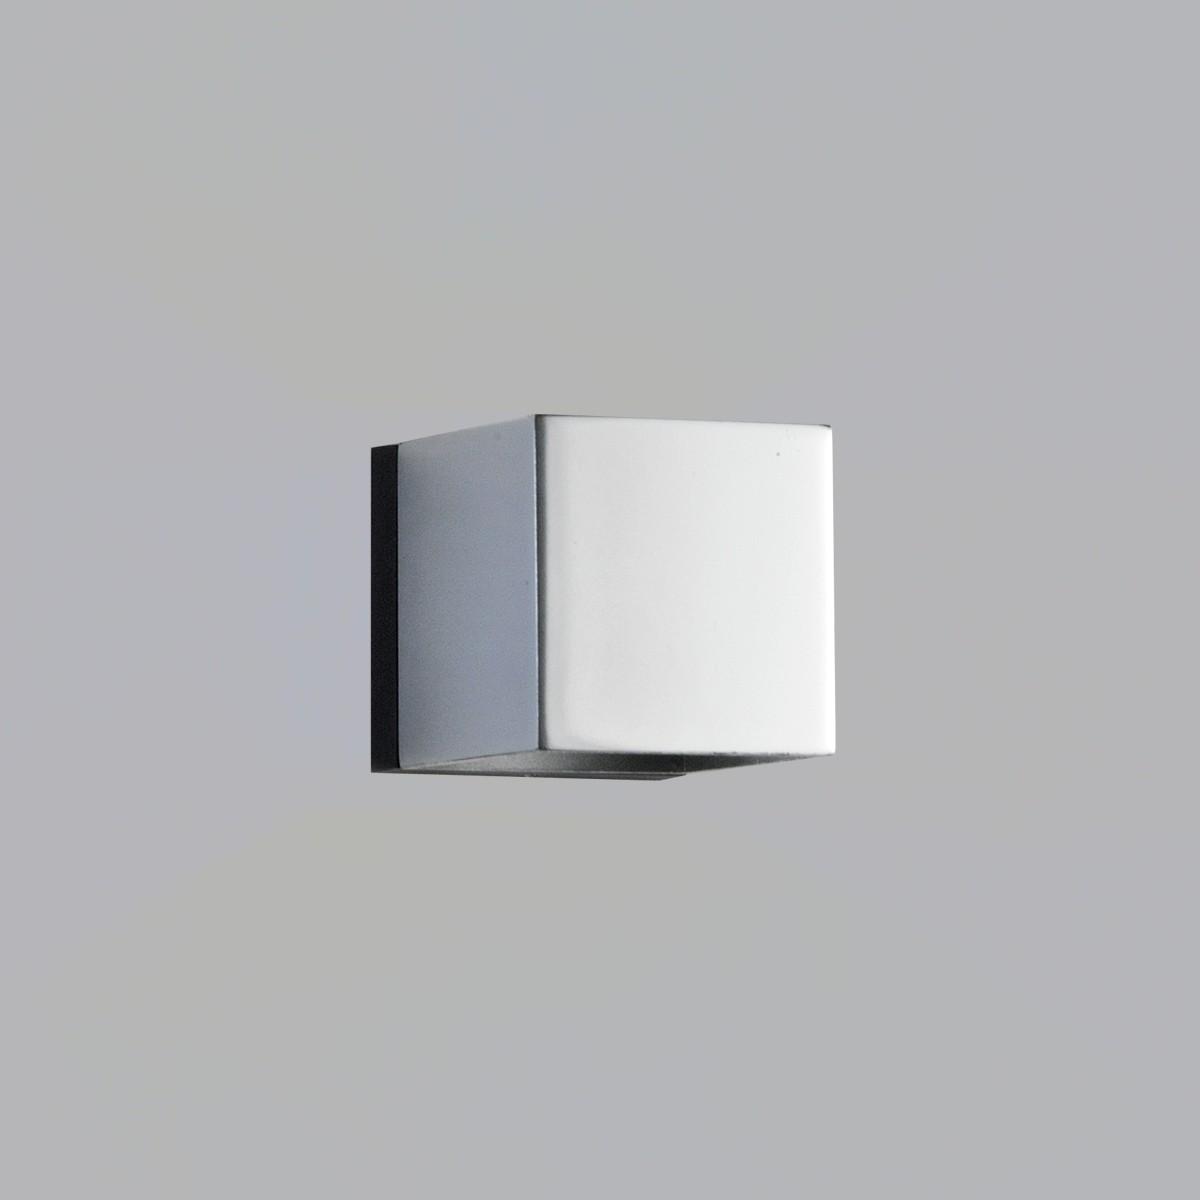 Milan Mini Dau LED Wandleuchte, 1. Generation, Chrom / mattschwarz